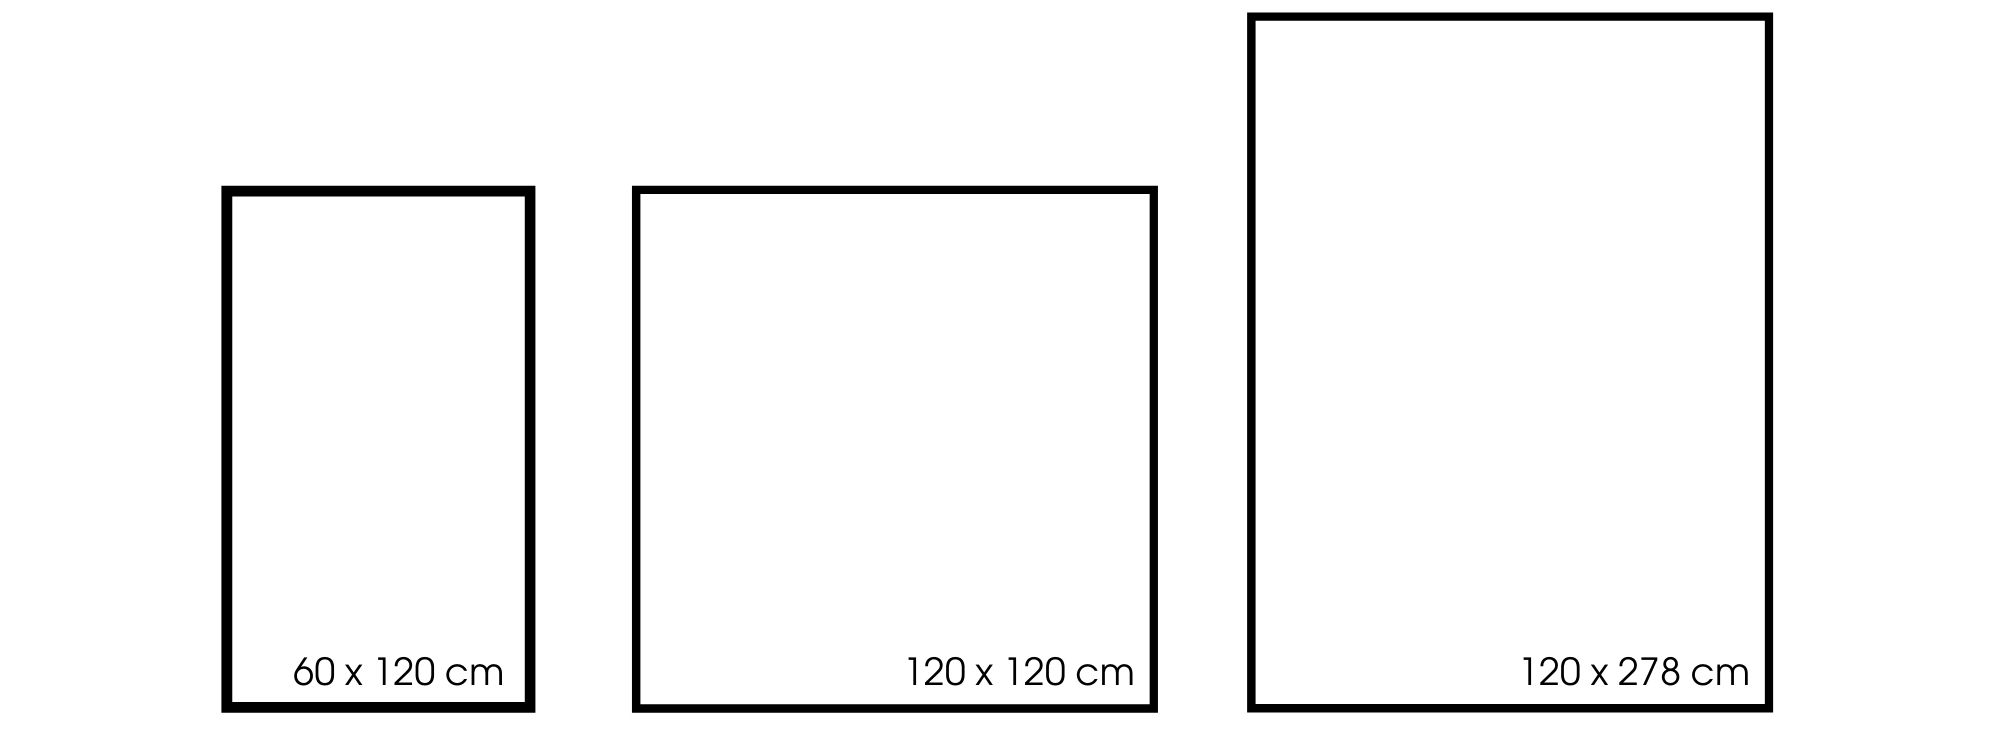 Größe Chimica R 1